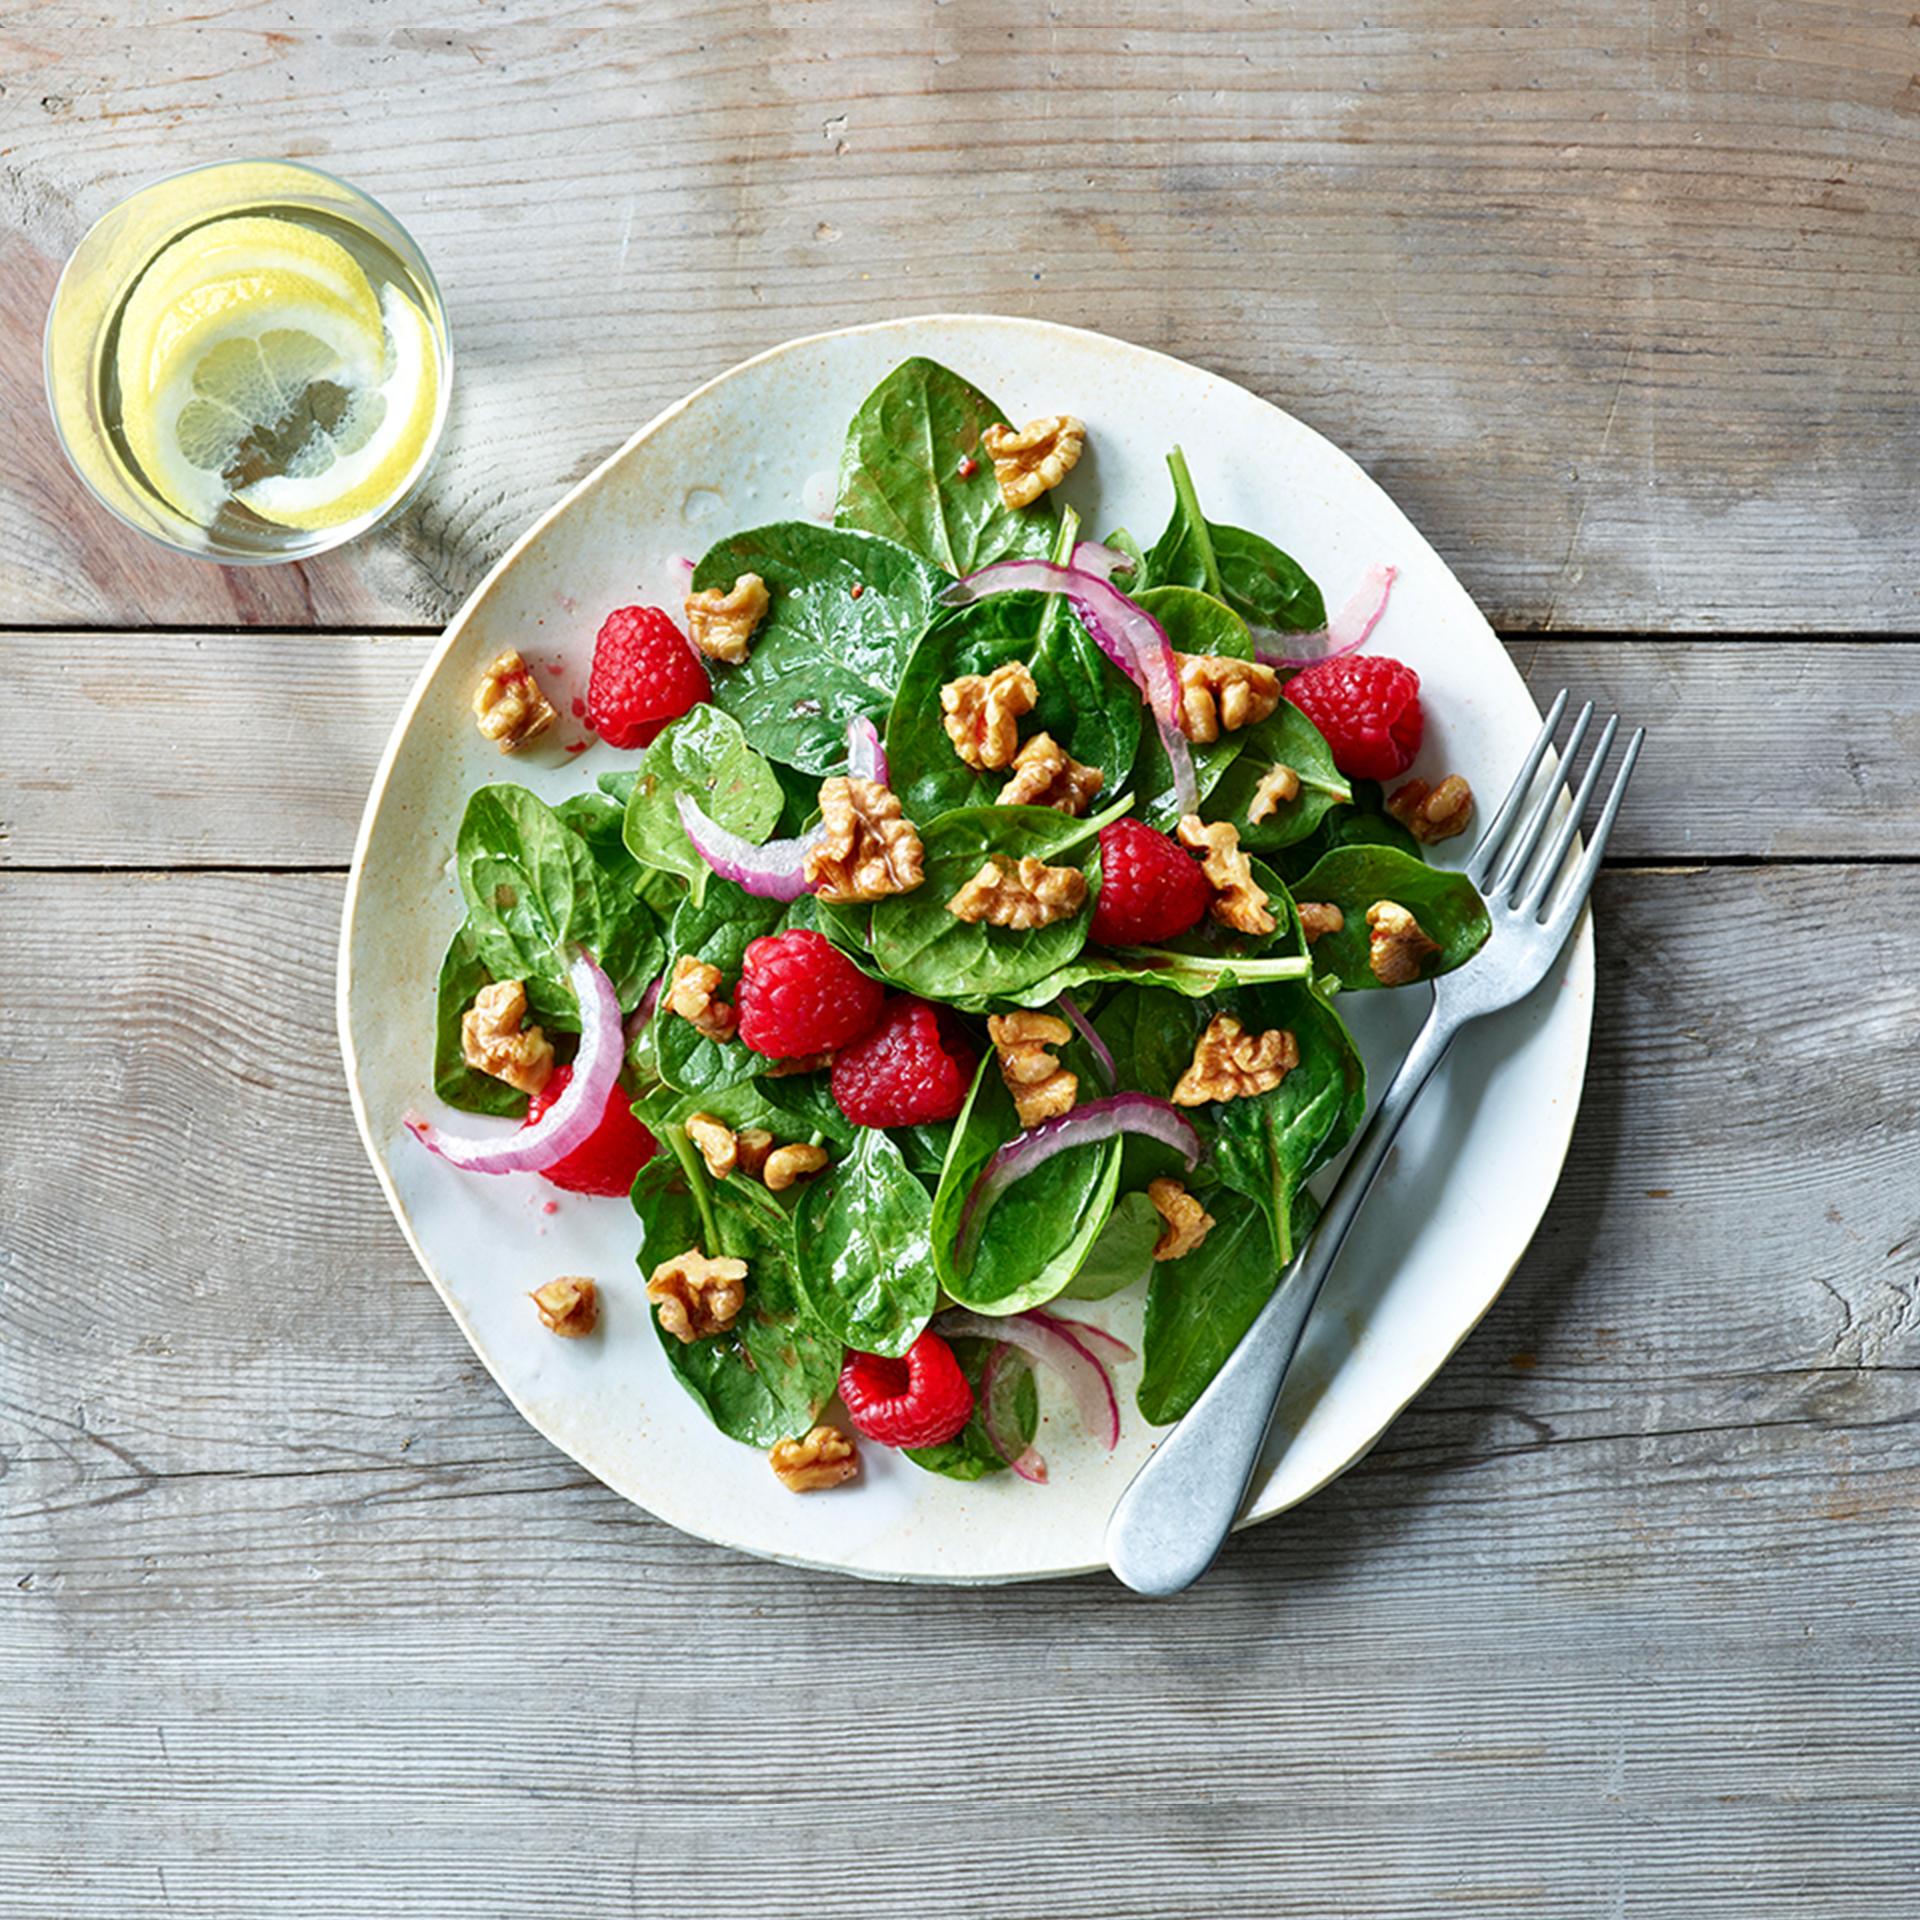 Walnut Raspberry Salad and Raspberry Vinaigrette